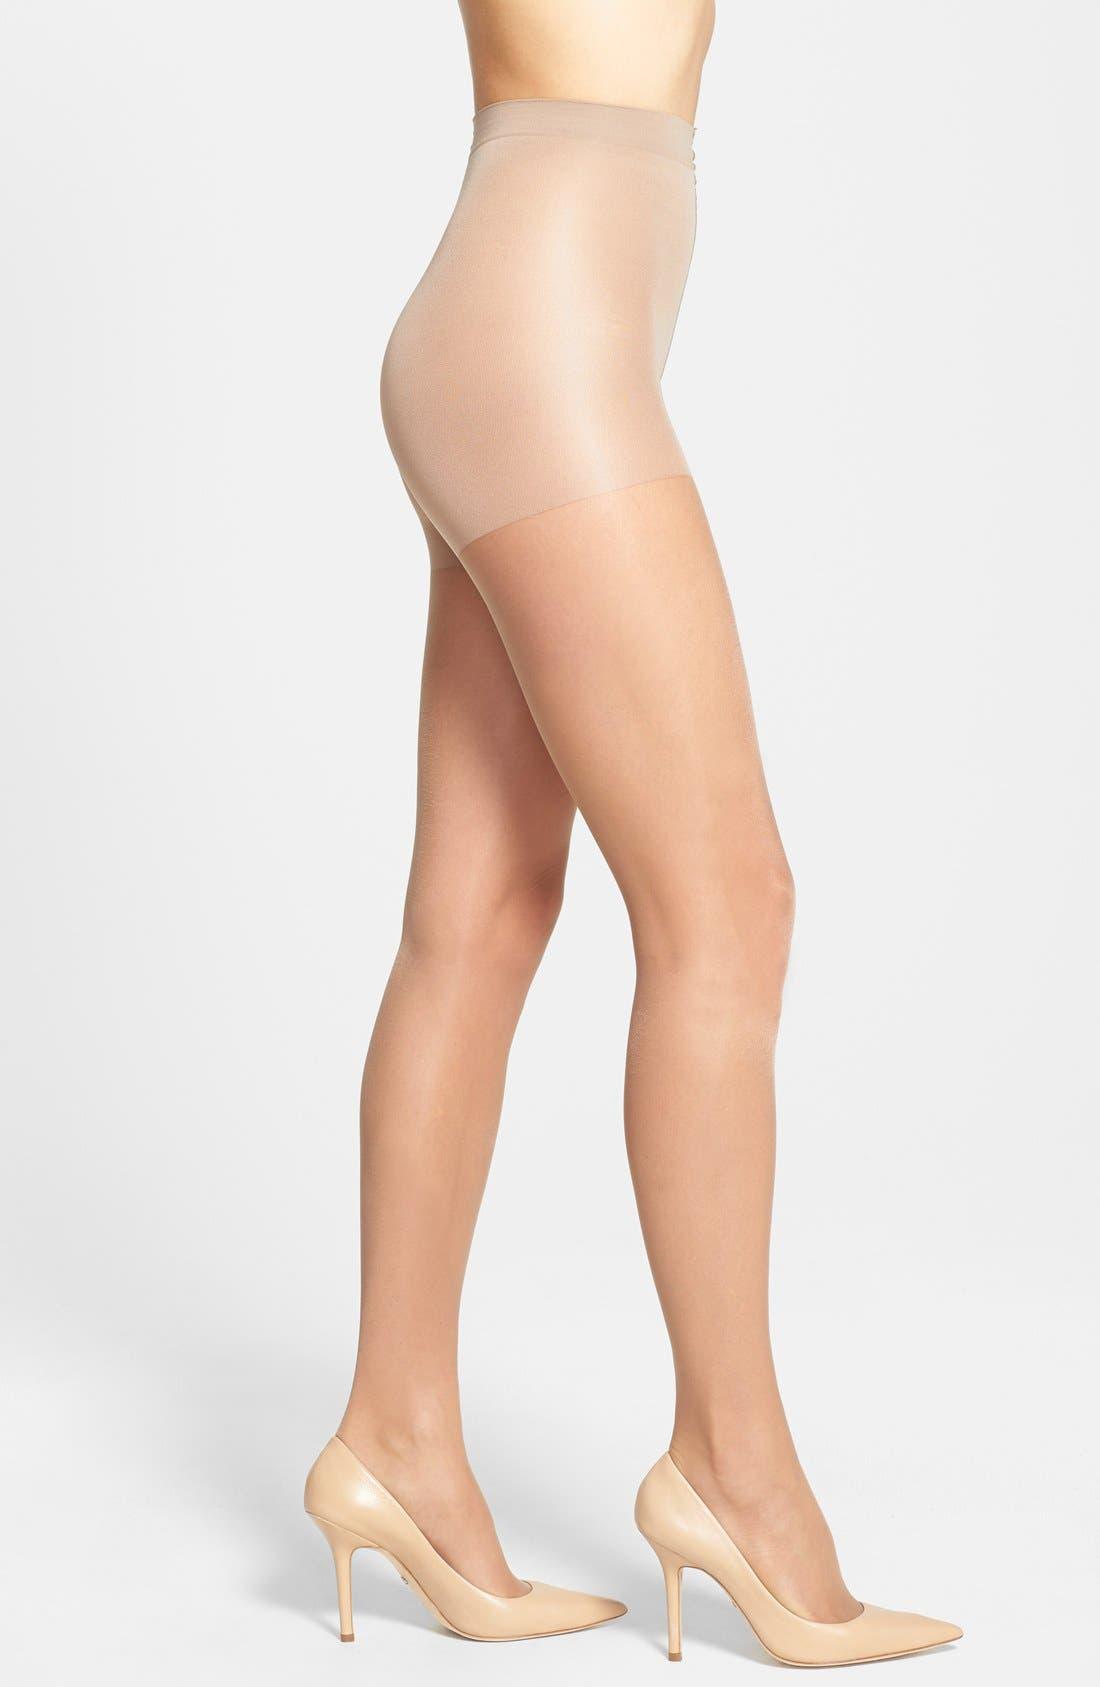 Calvin Klein 'Sheer Essentials - Matte Ultra Sheer' Control Top Pantyhose